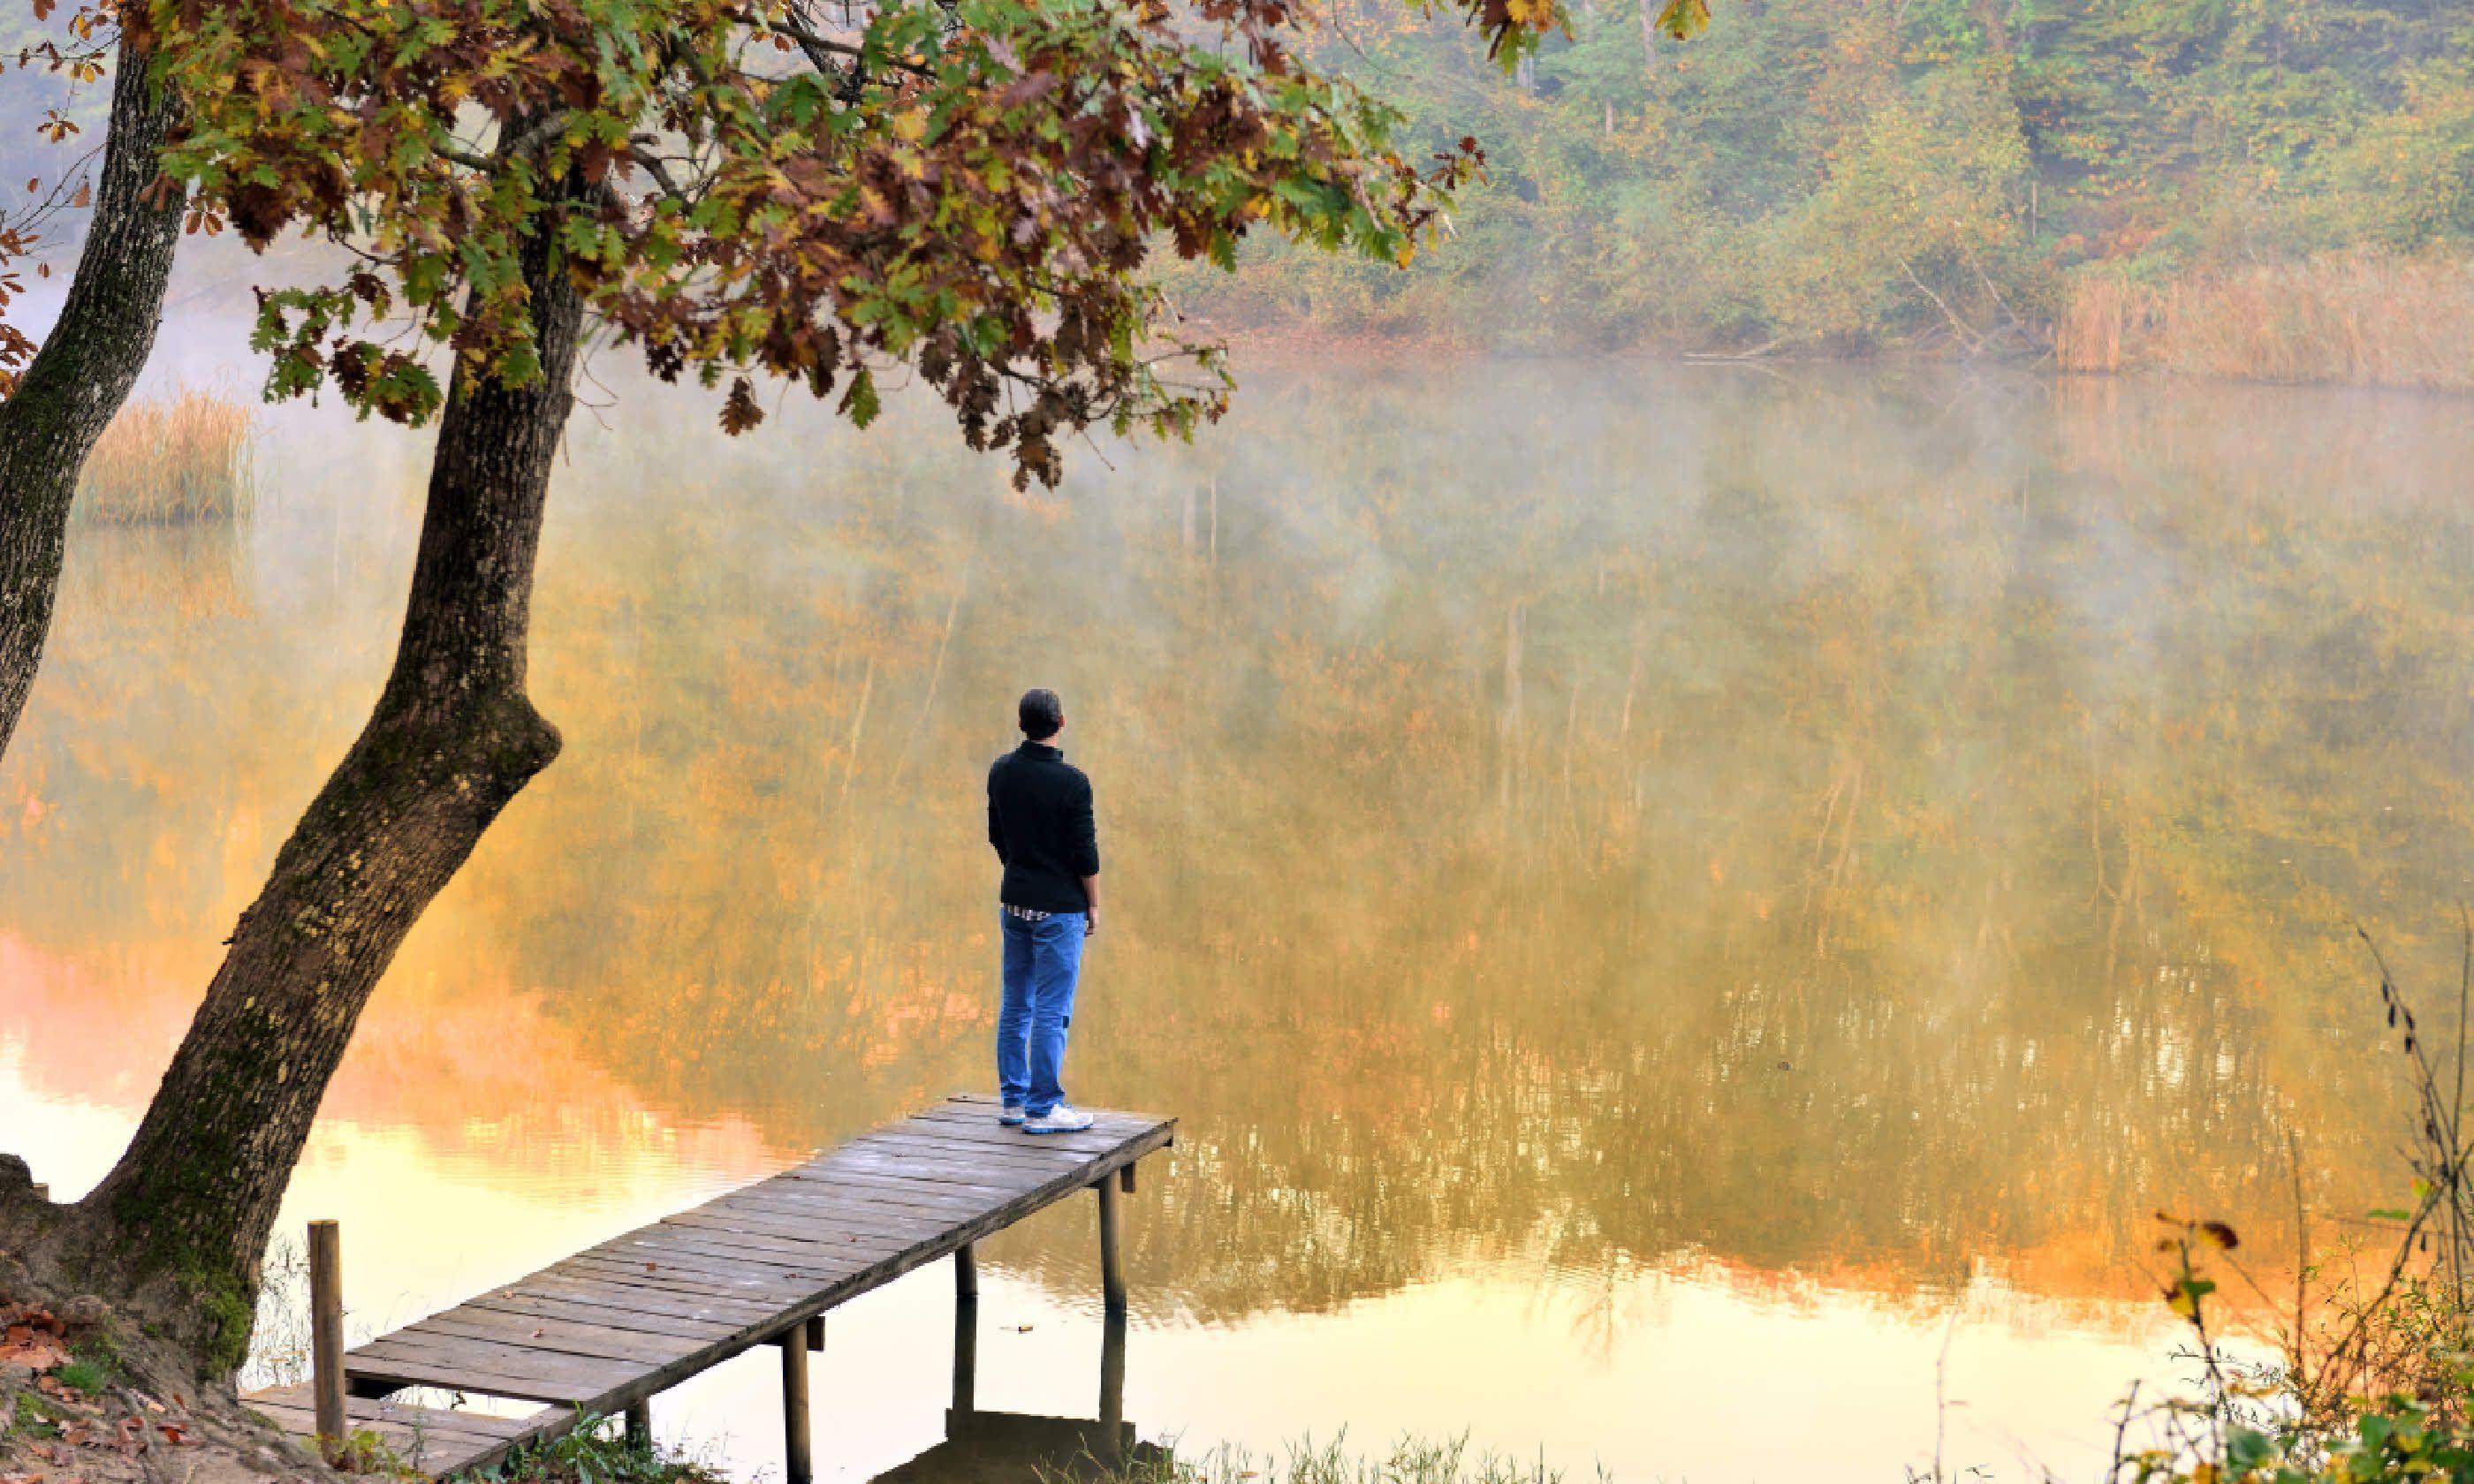 Travelling solo (Shutterstock)